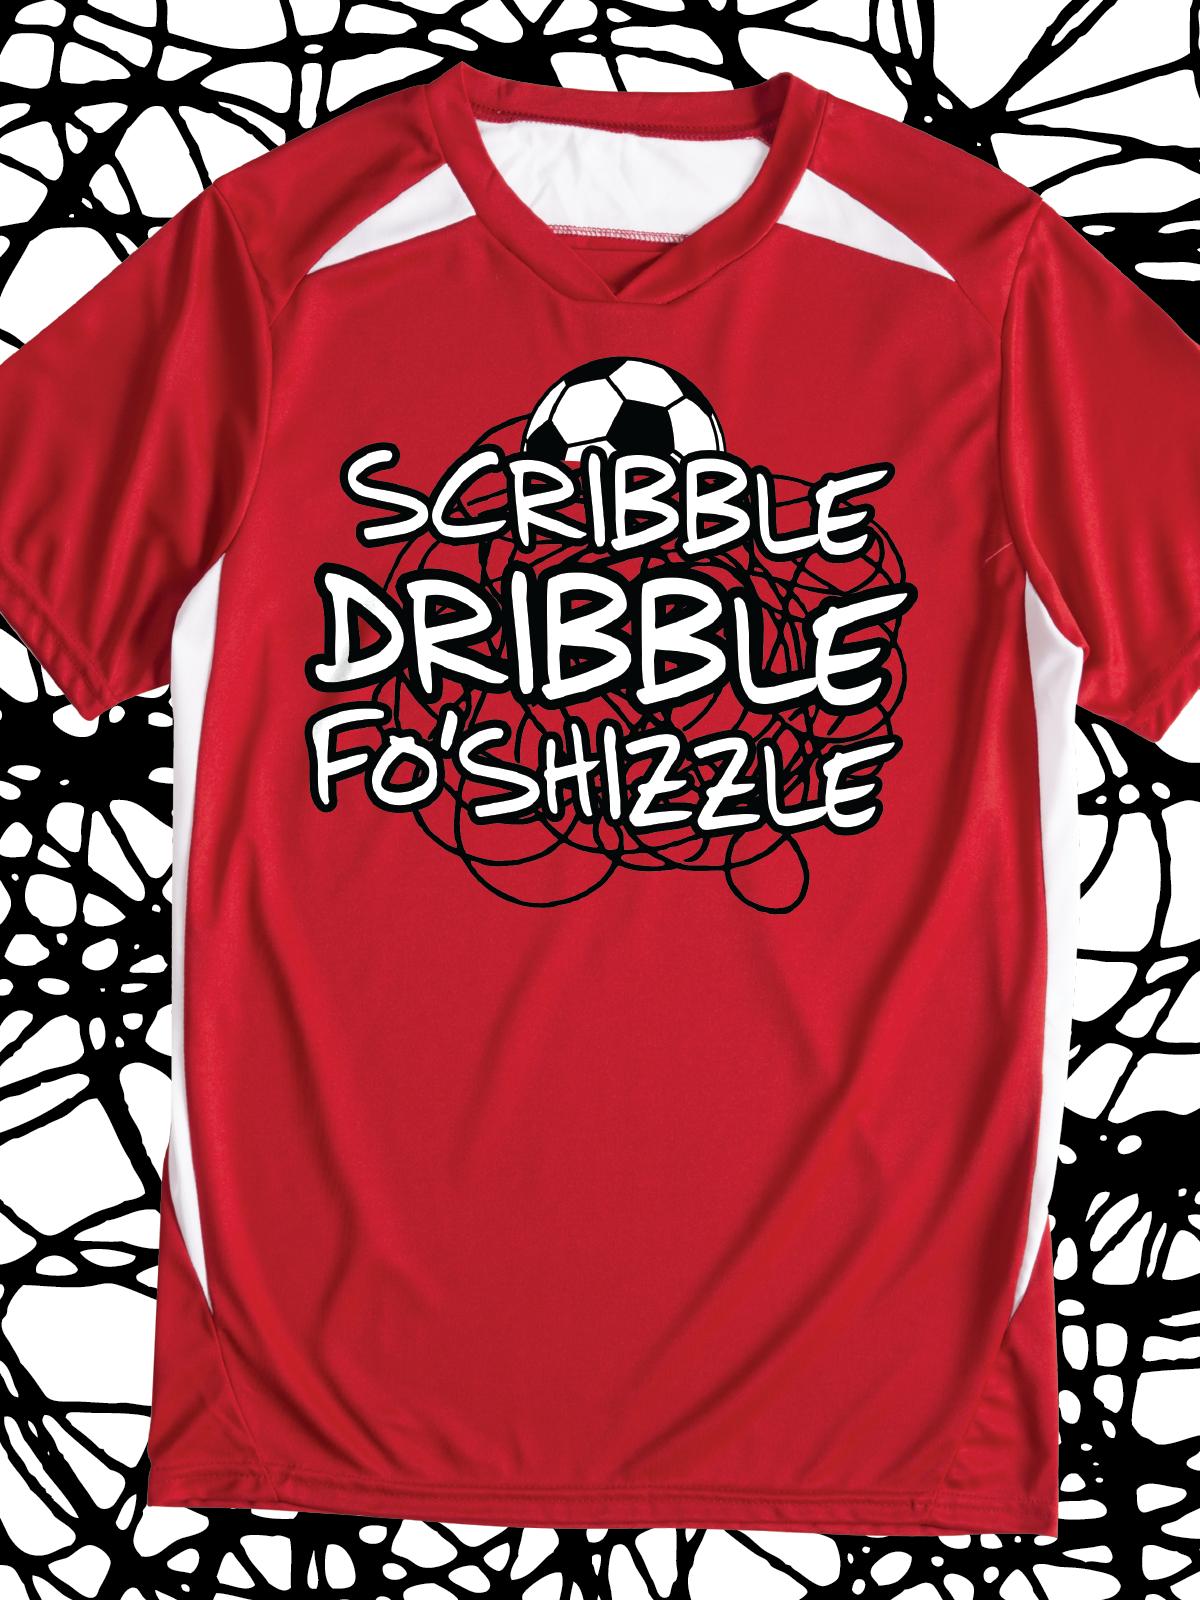 Scribble Dribble Foshizzle Funny Design Idea For Custom Soccer